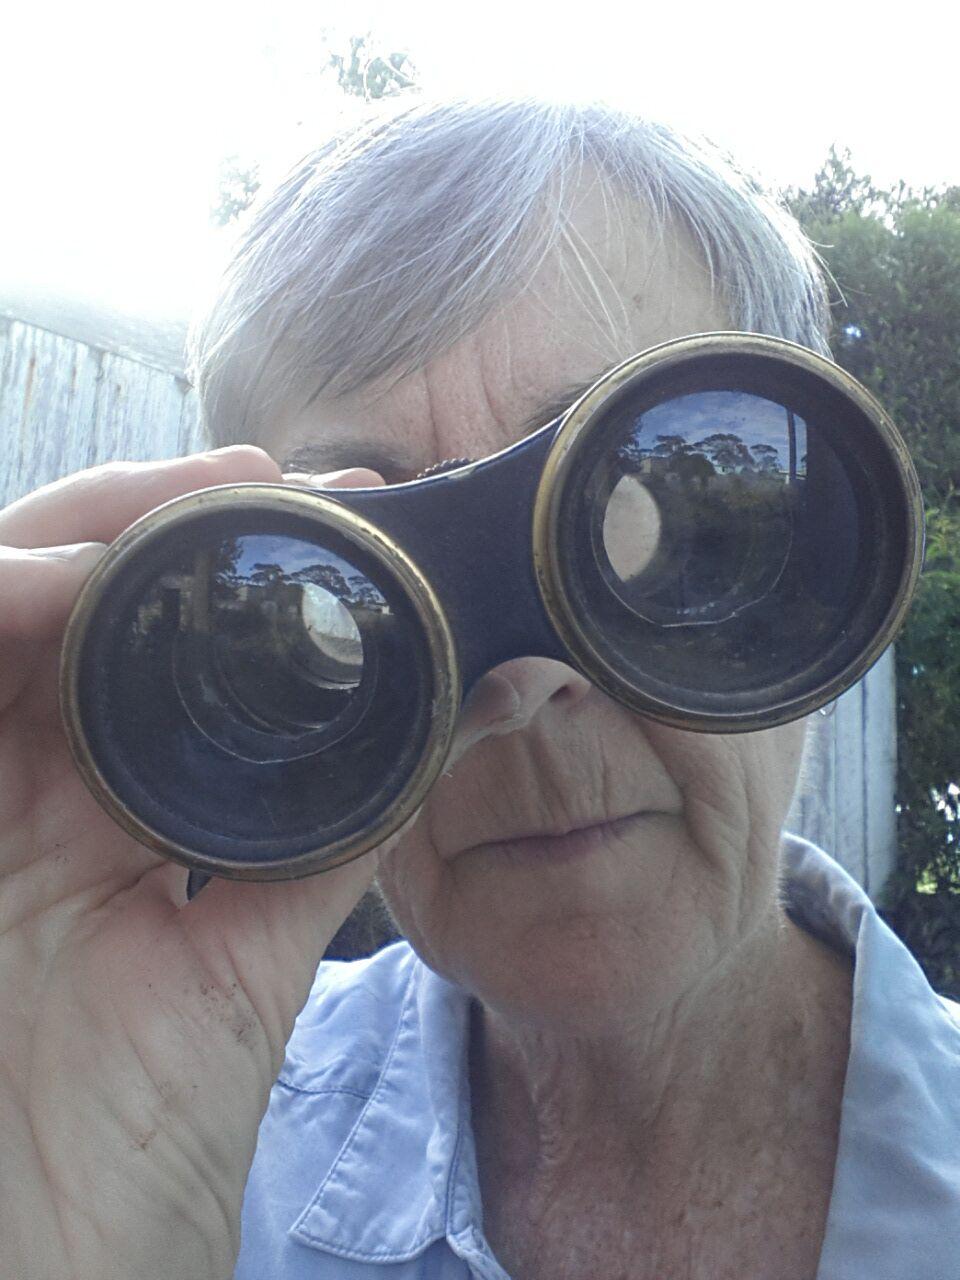 The author looking through binoculars.